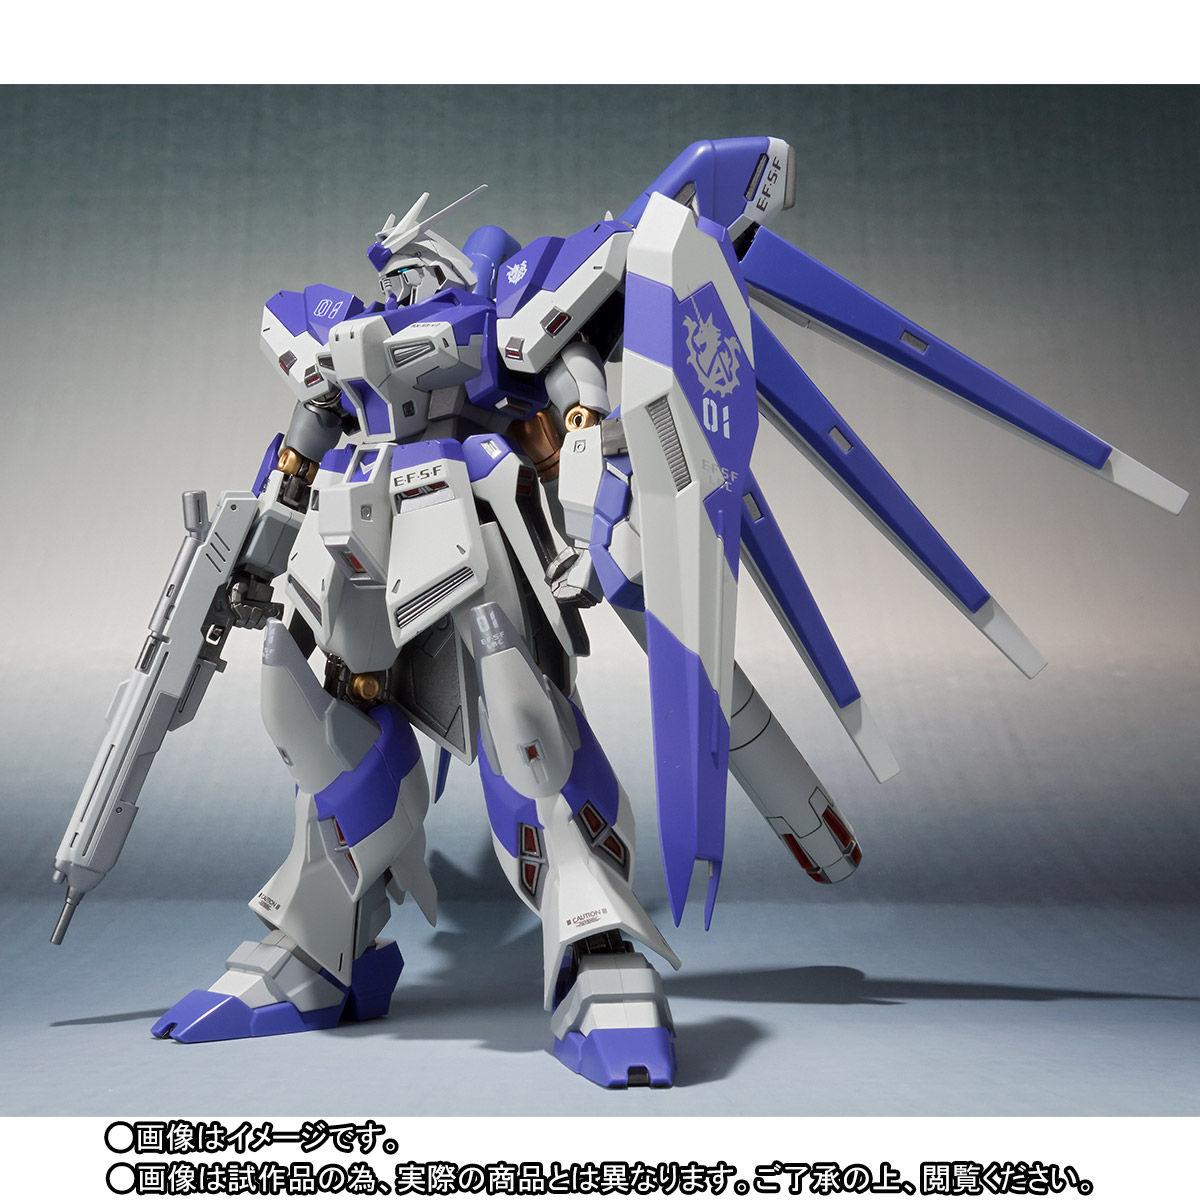 METAL ROBOT魂〈SIDE MS〉『Hi-νガンダム』逆襲のシャア 可動フィギュア-002